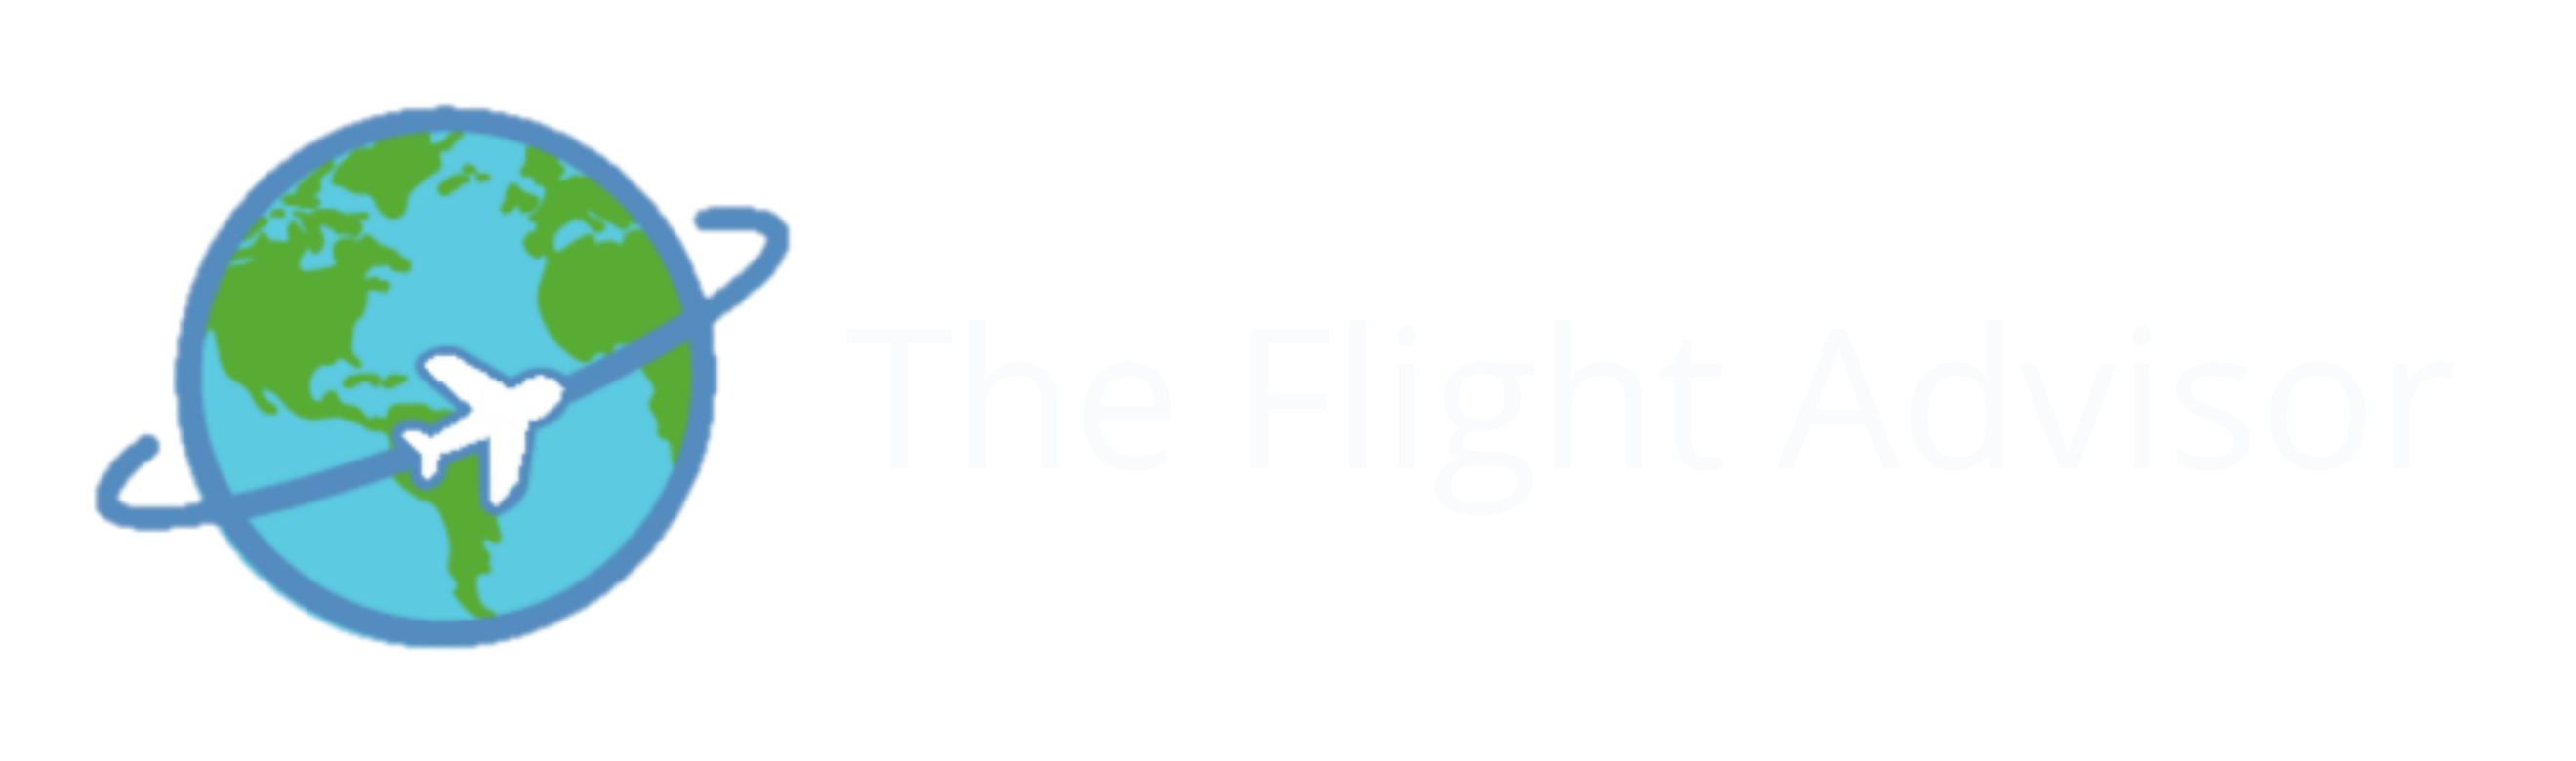 The Flight Advisor